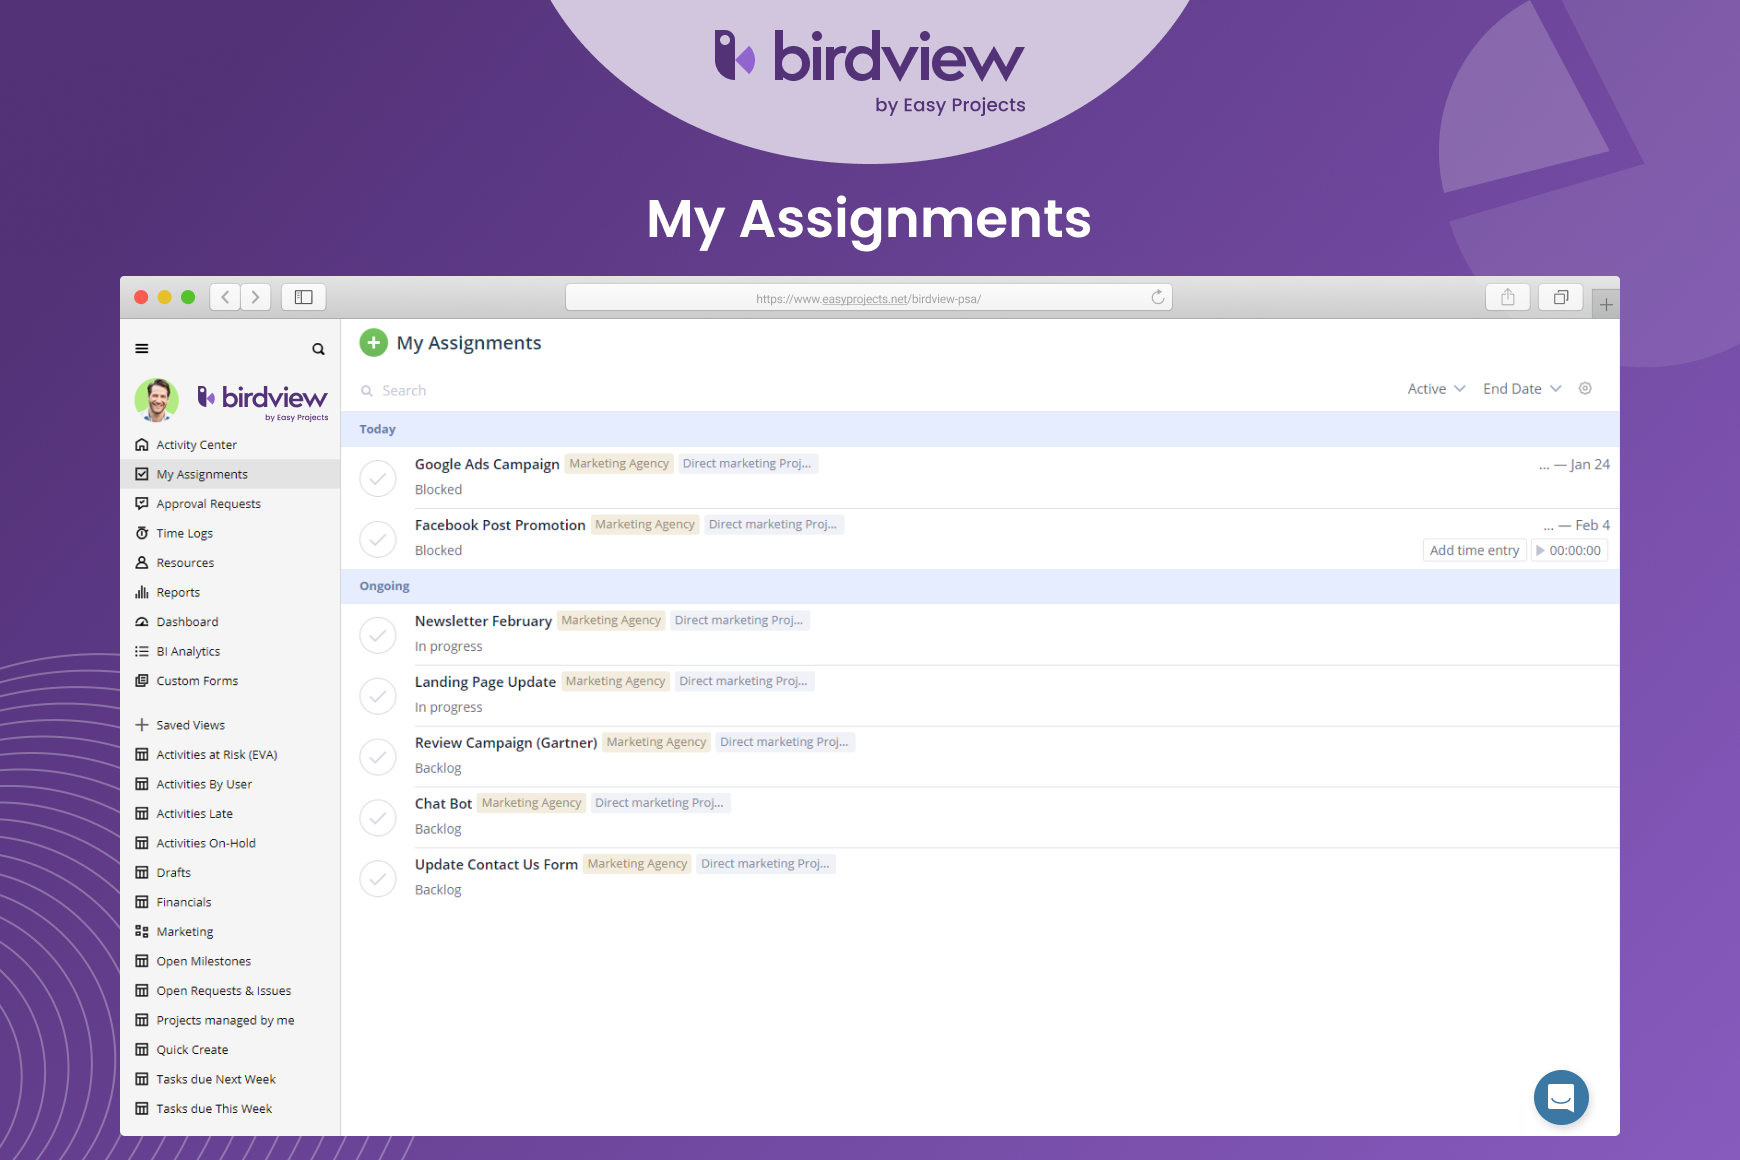 Birdview PSA - My assignments